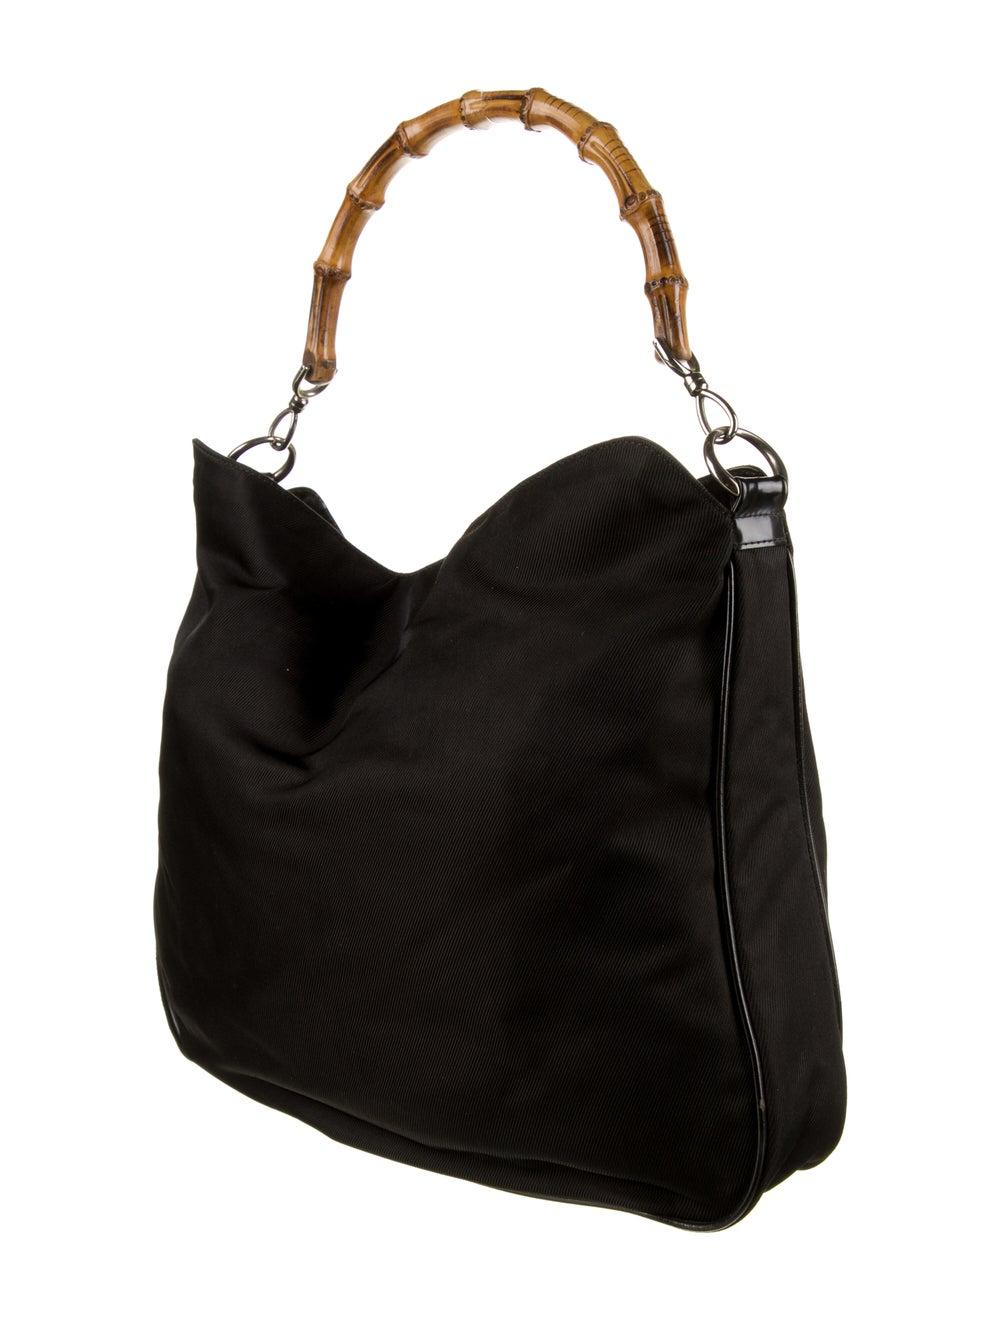 Gucci Vintage Nylon Bamboo Bag Black - image 3